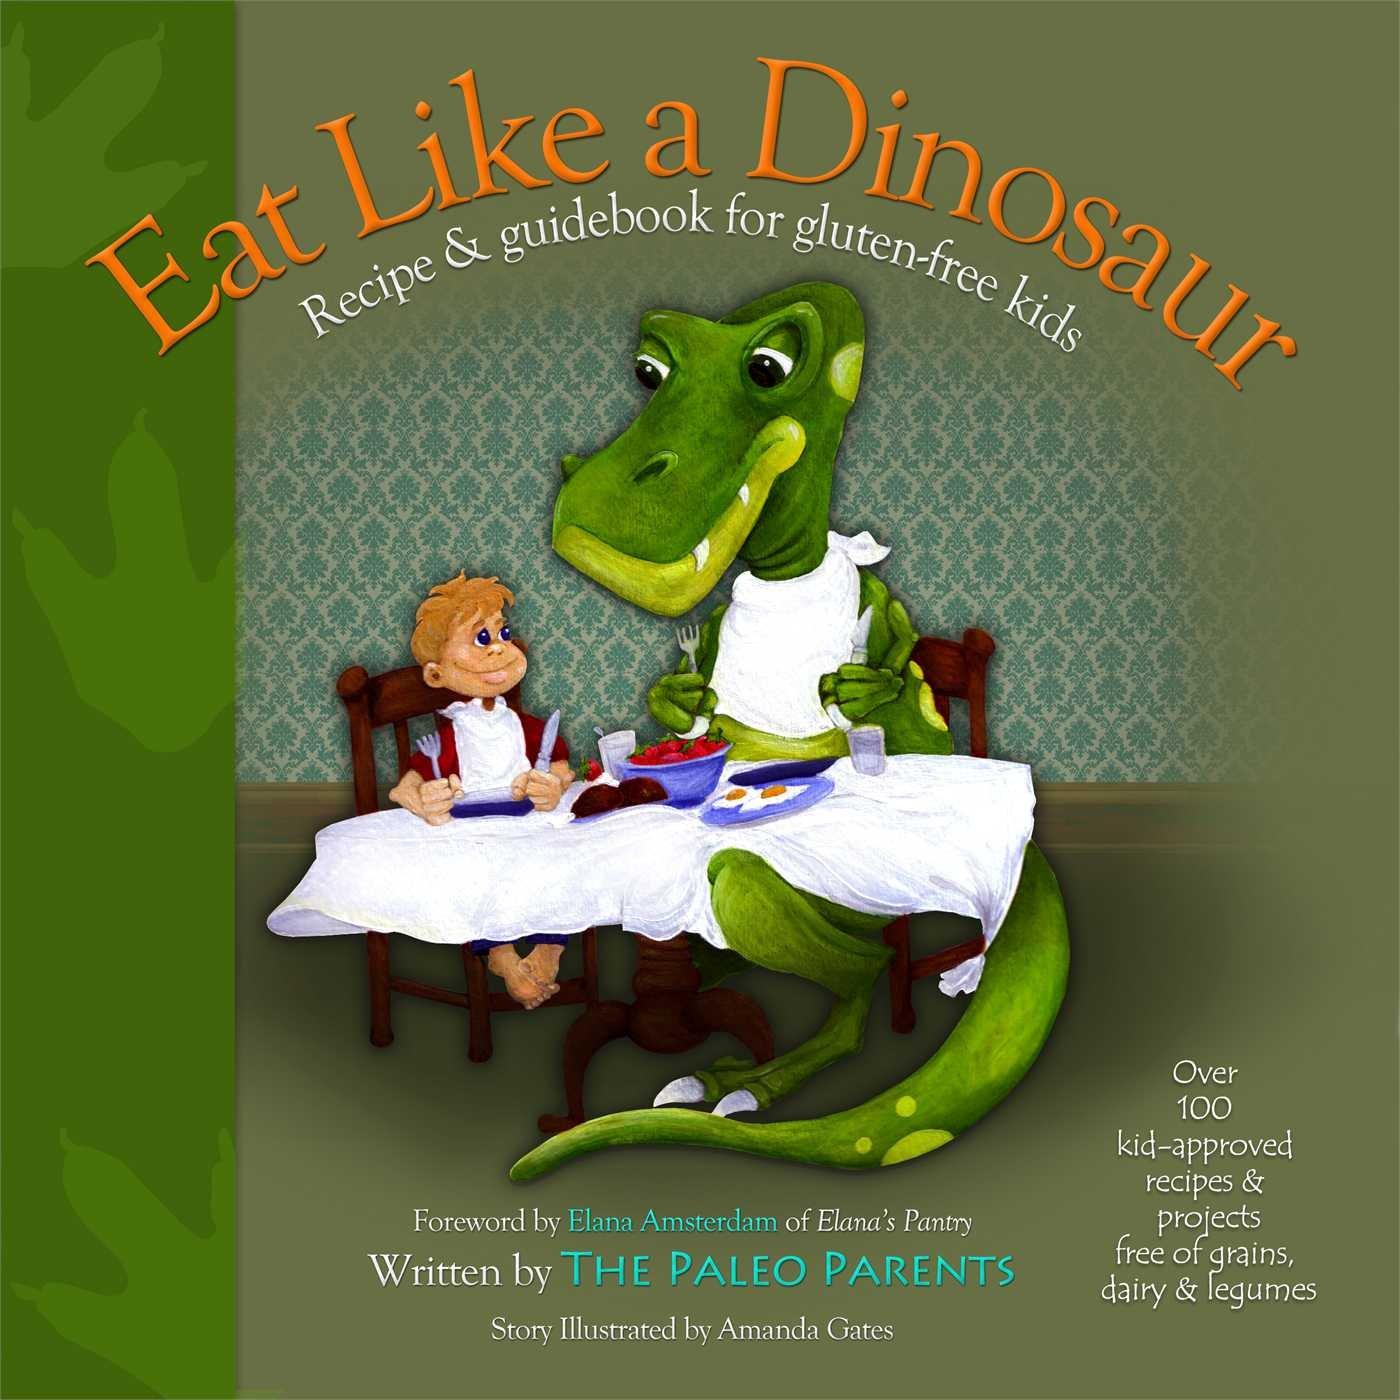 eat like a dinosaur recipe u0026 guidebook for gluten free kids